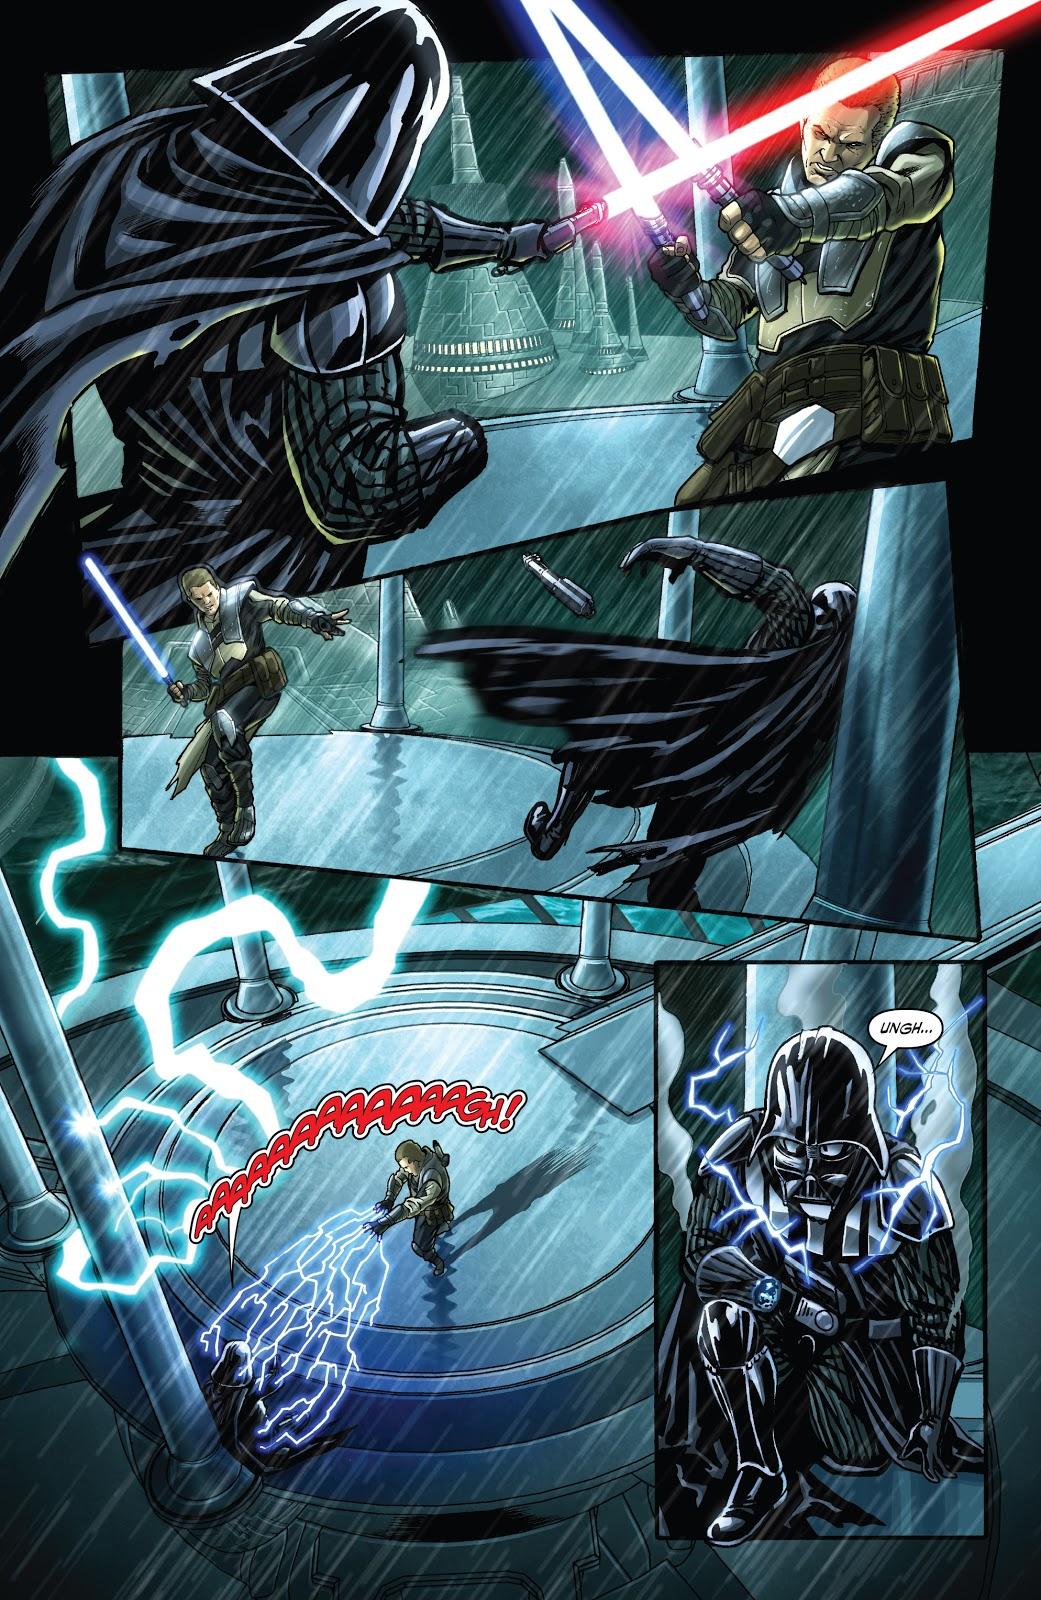 SS -  Darth Plagueis (Meatpants) vs Galen Marek (ArkhamAsylum3) - Page 3 Galen_11